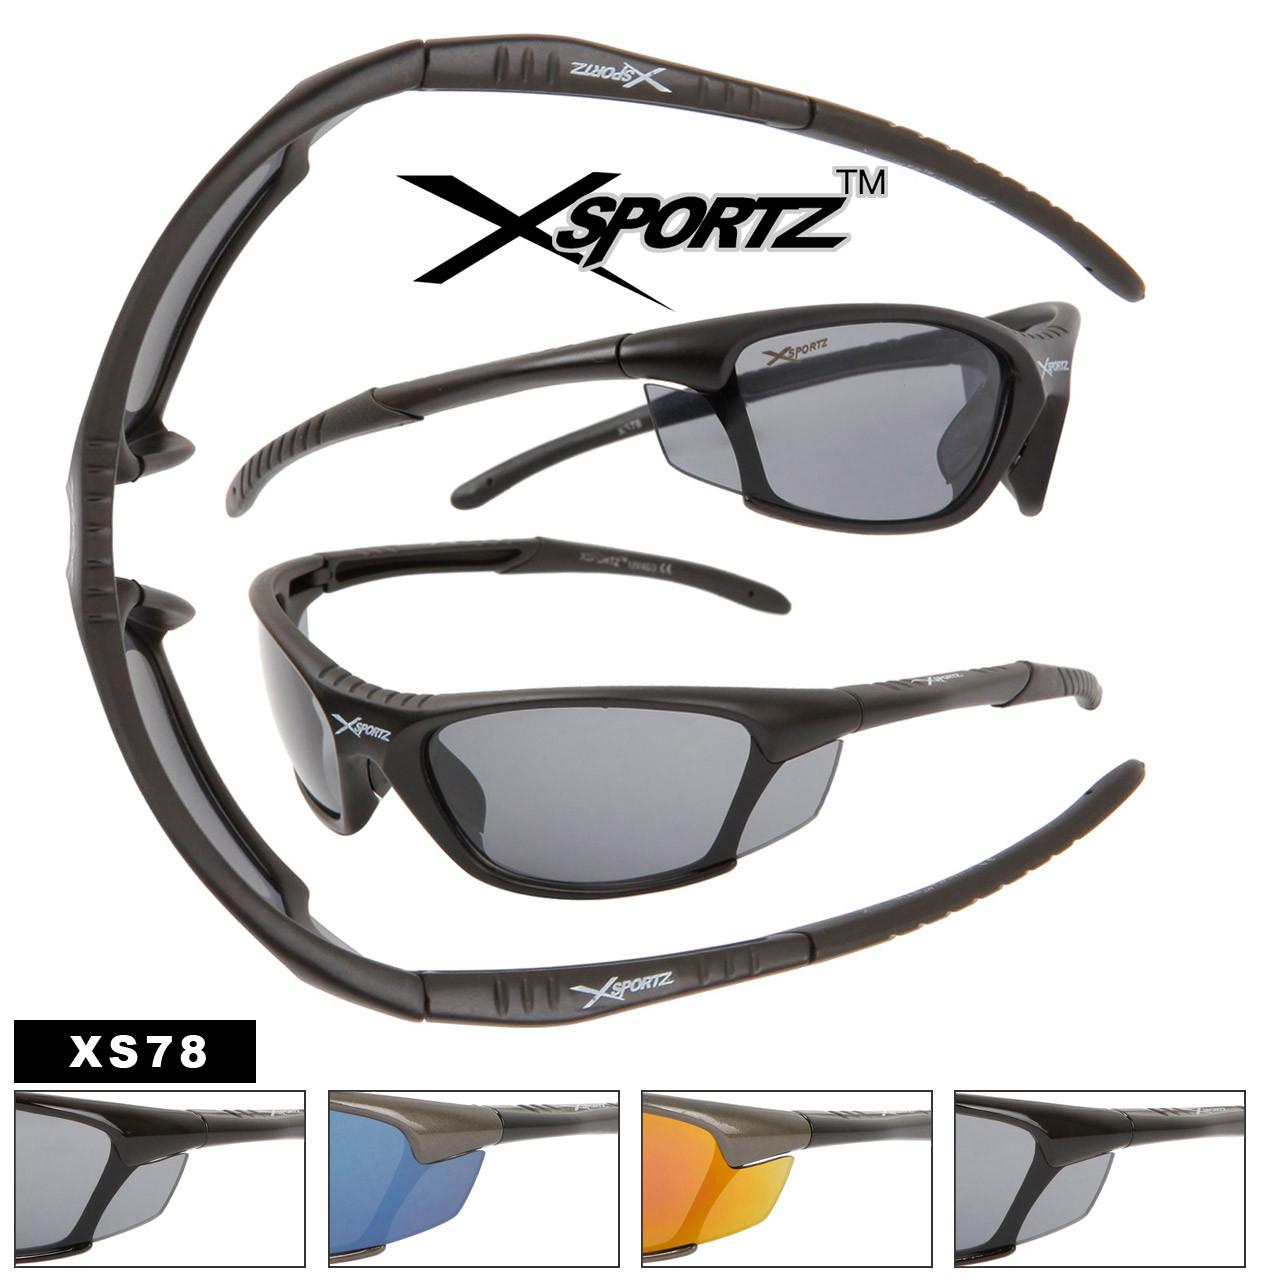 Xsportz XS78 Wholesale Sunglasses